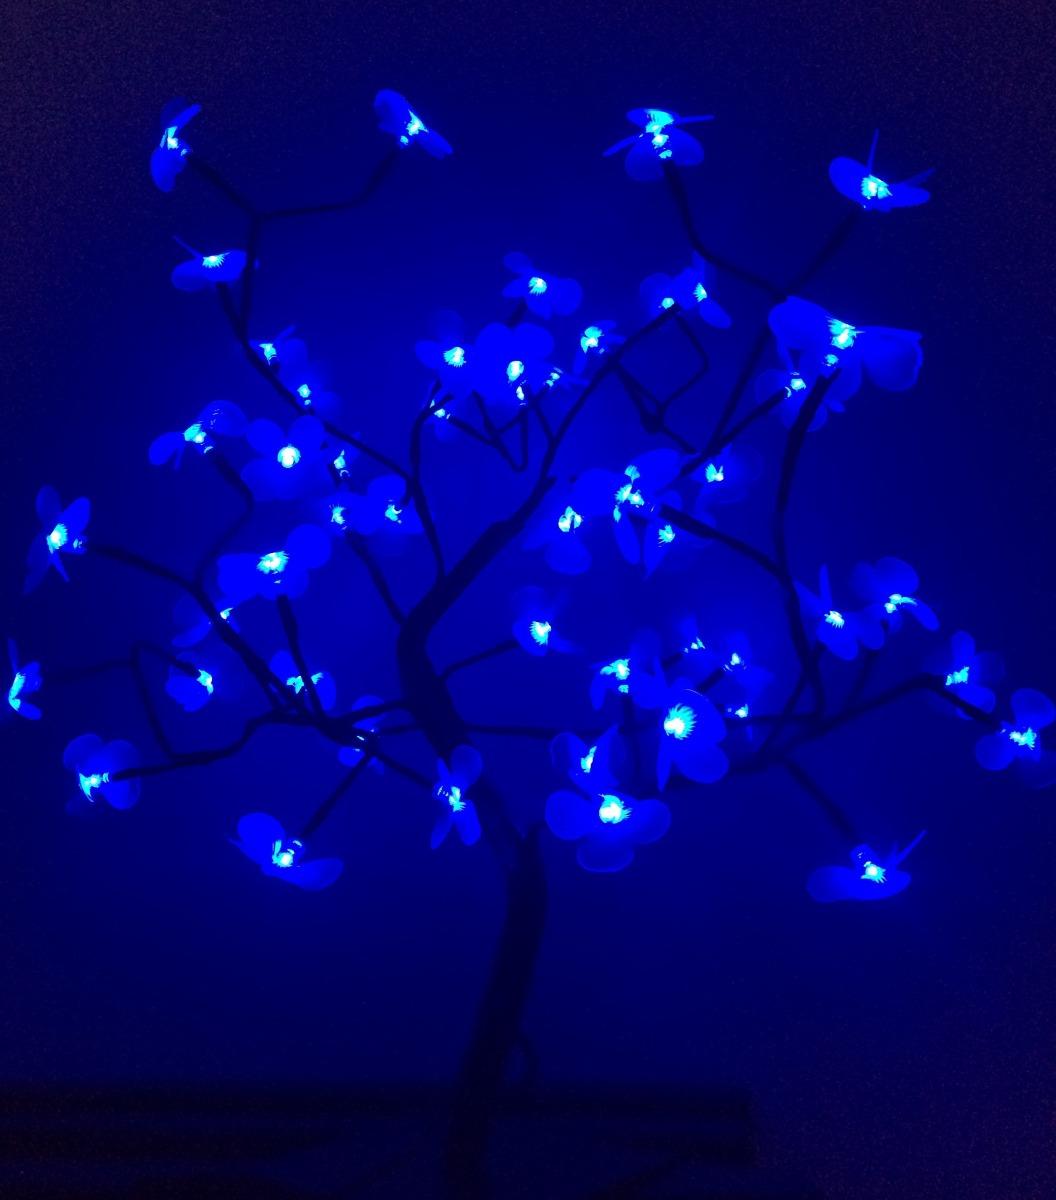 decoracao arvore de natal azul:Árvore Natal Decorativa Led Flor Azul Alt 60 Cm S/pisca – R$ 110,00